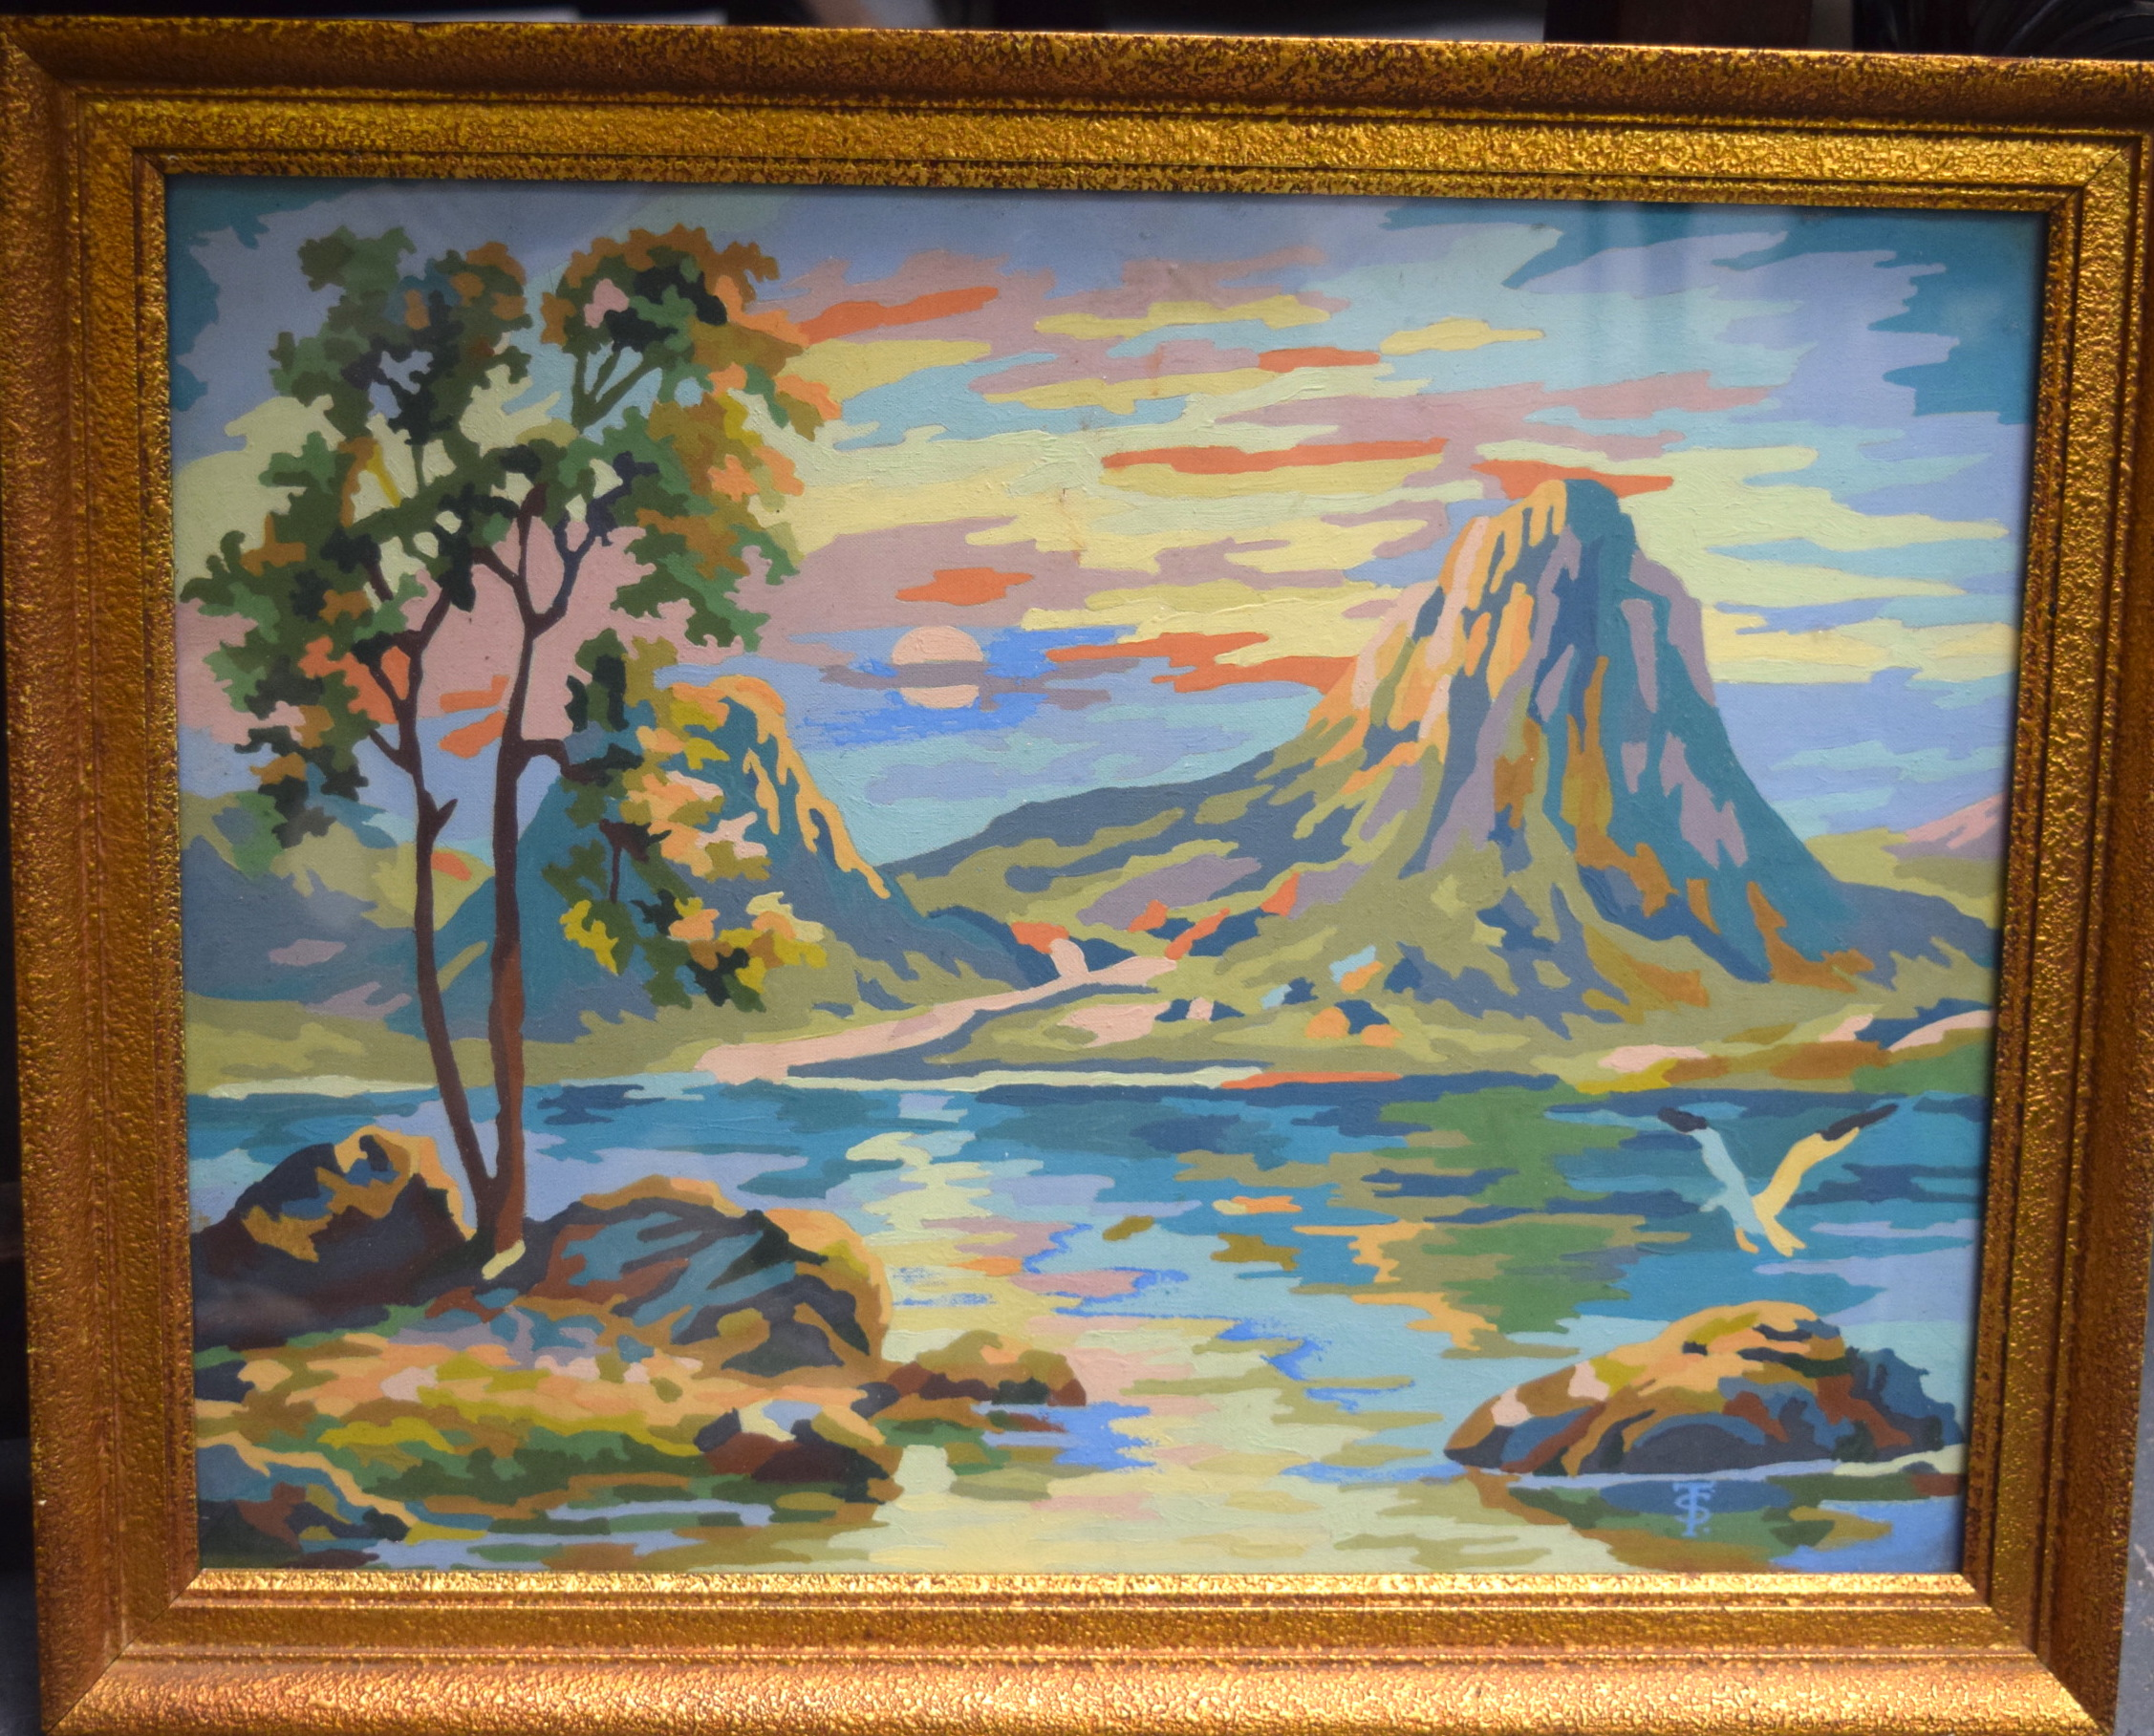 Lot 2790 - T.S (20th century) FRAMED OIL ON BOARD, monogramed, mountainous landscape. 30.5 cm x 39.5 cm.